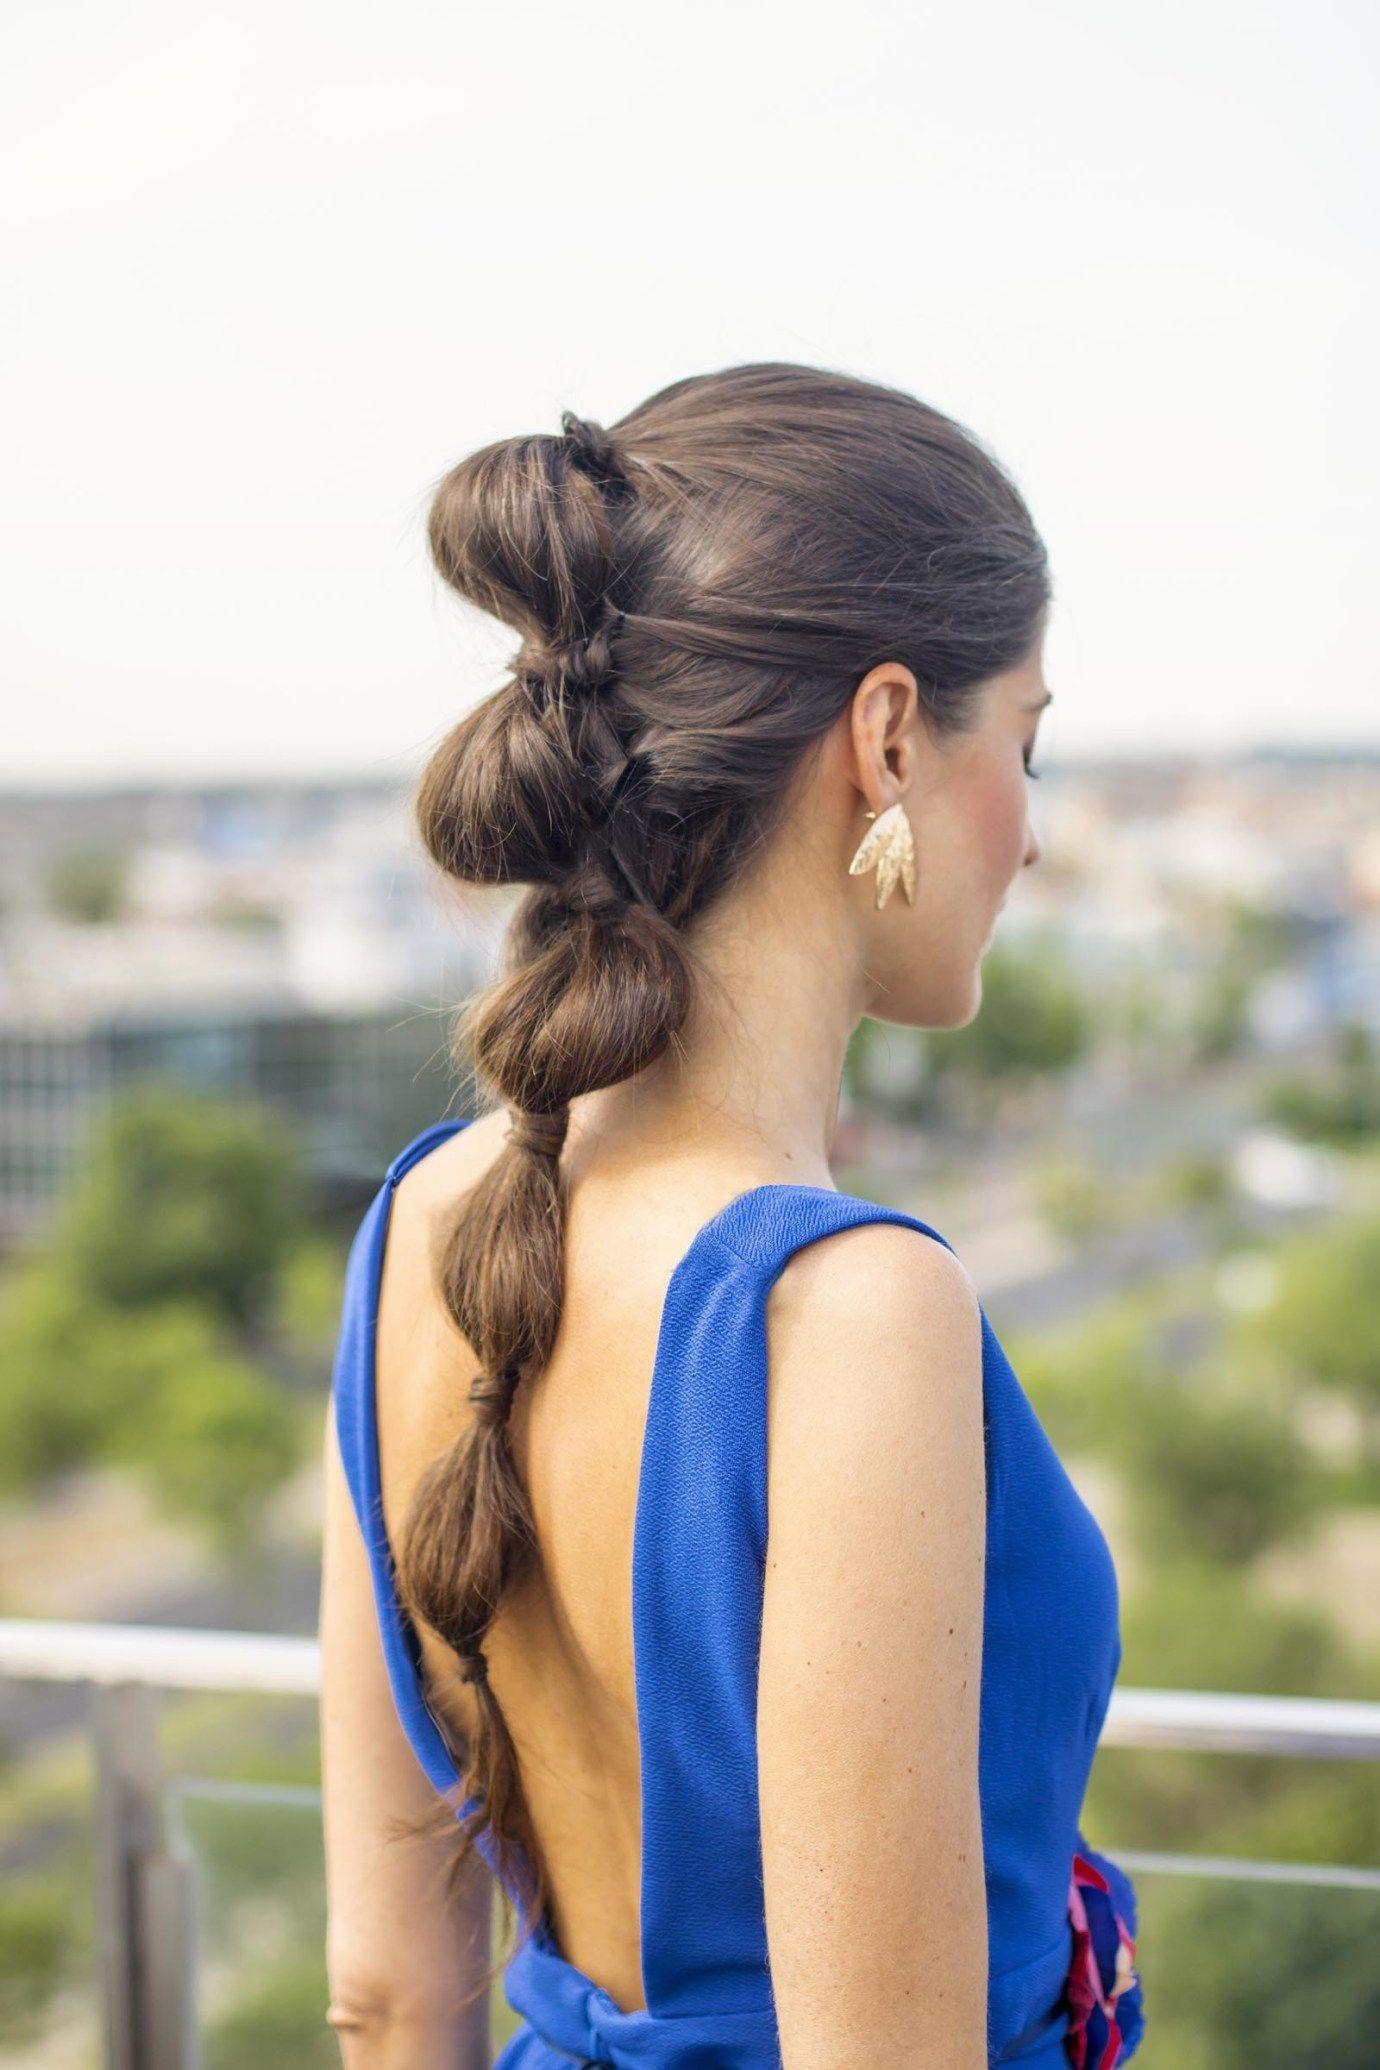 Peinado Coleta Burbujas Invitada Boda Peinados Con Coleta Peinados Boda Pelo Largo Peinados